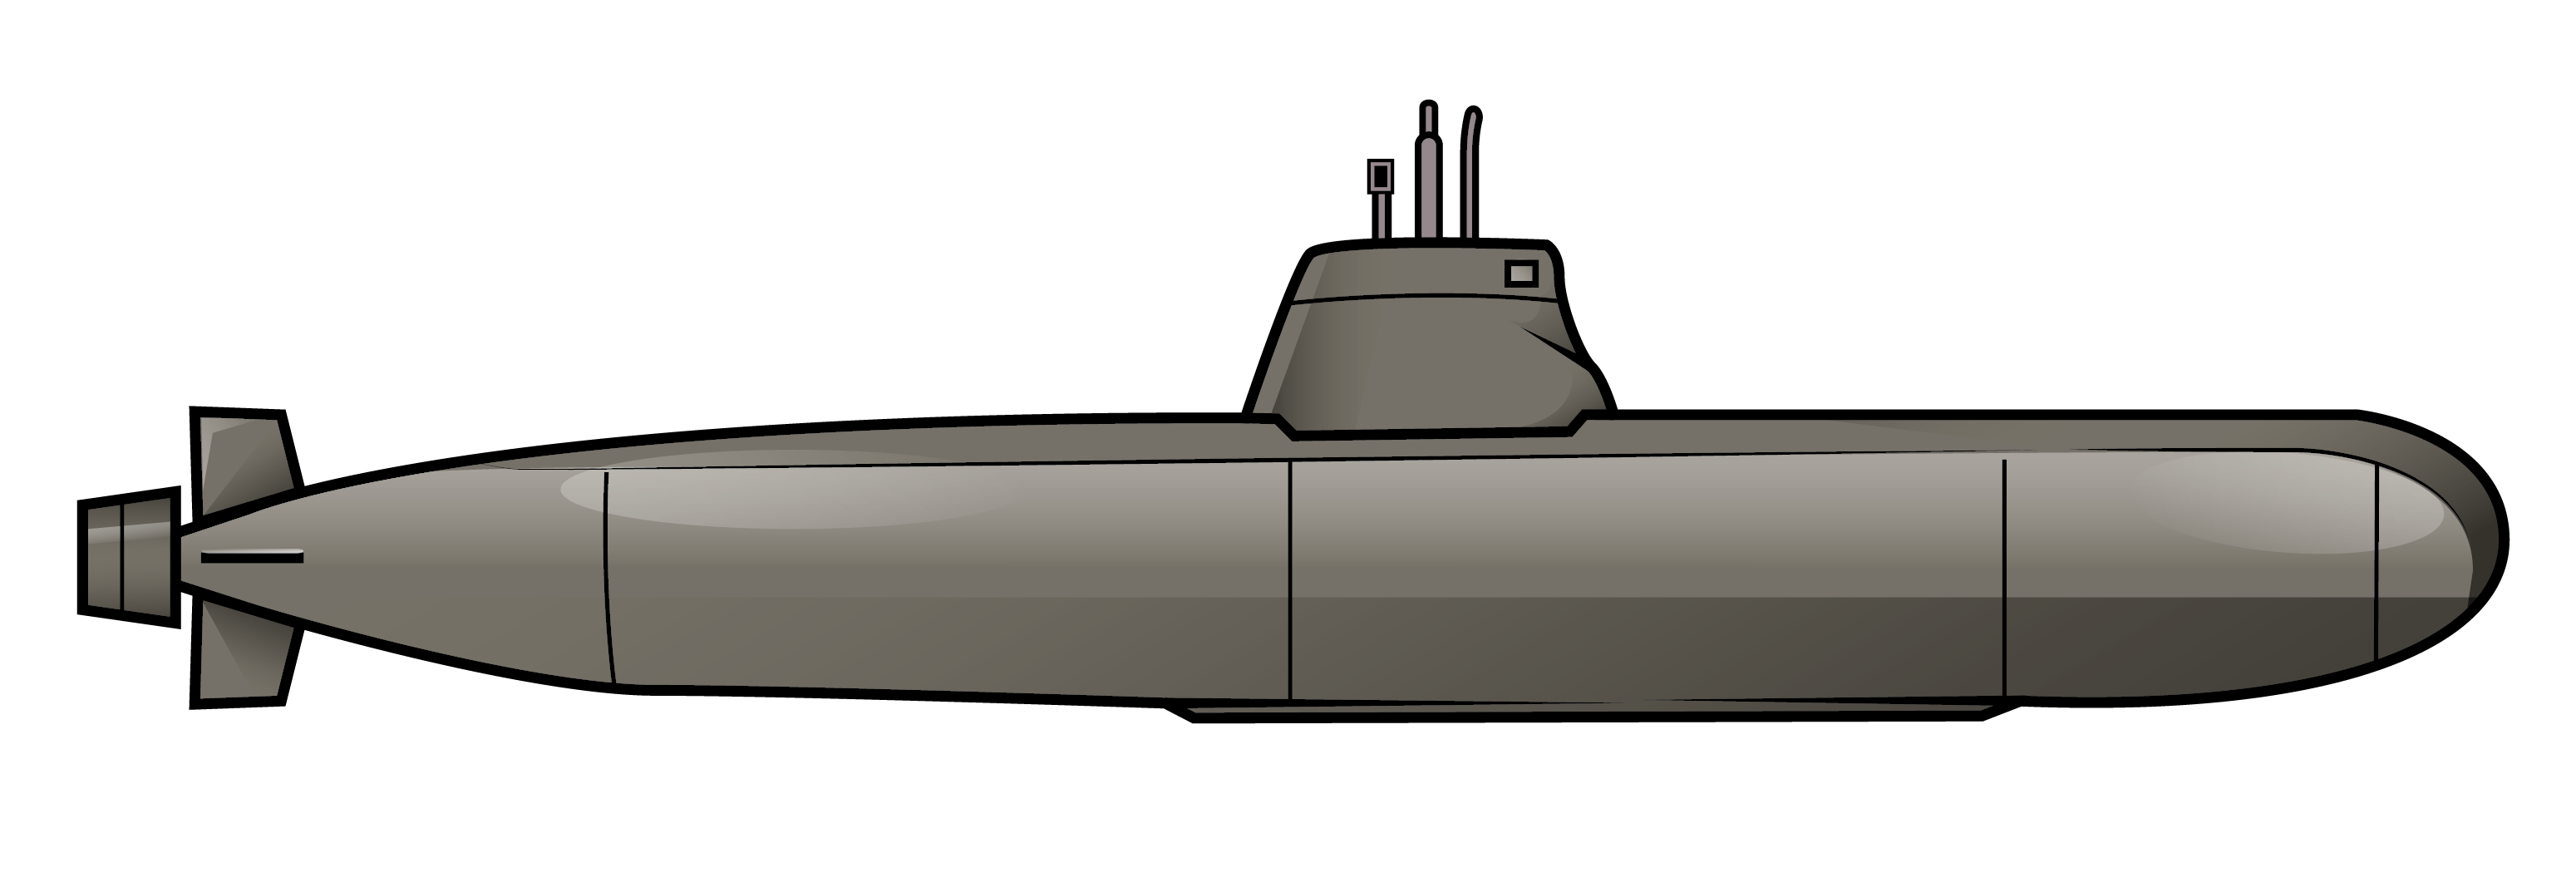 Free Submarine Cliparts, Download Free Clip Art, Free Clip.